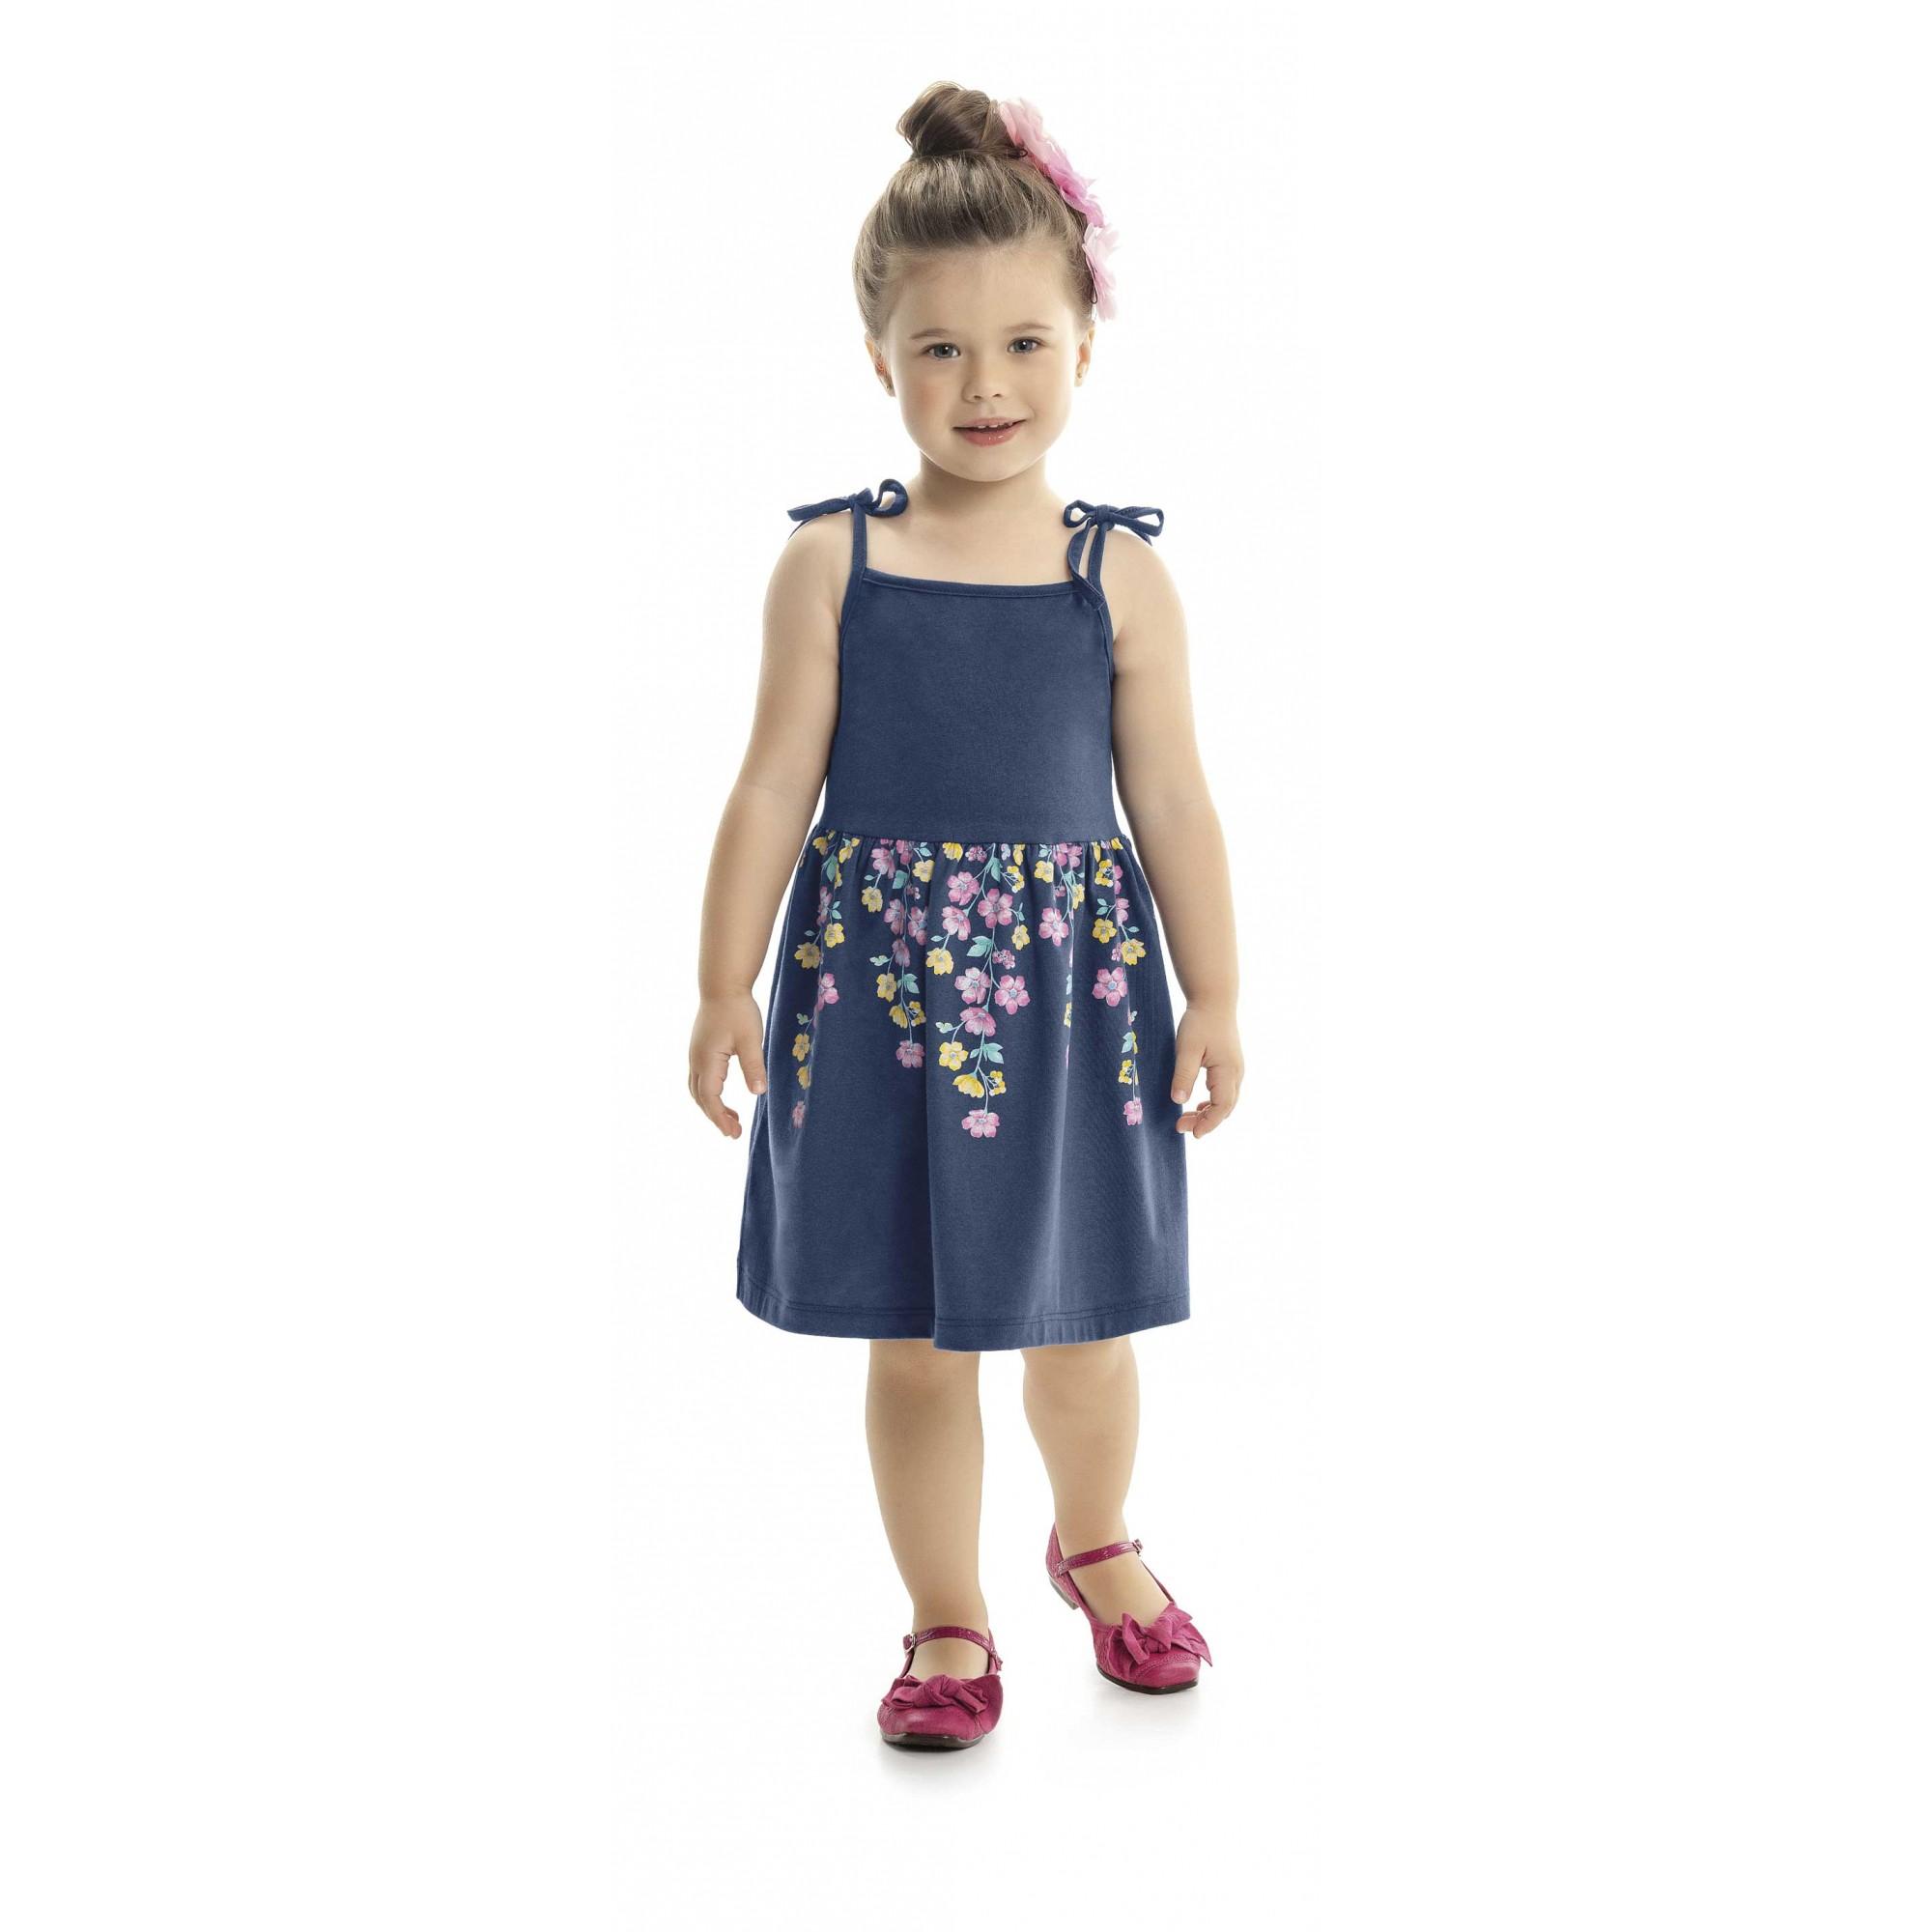 Vestido Infantil Verão Alças - Kaiani